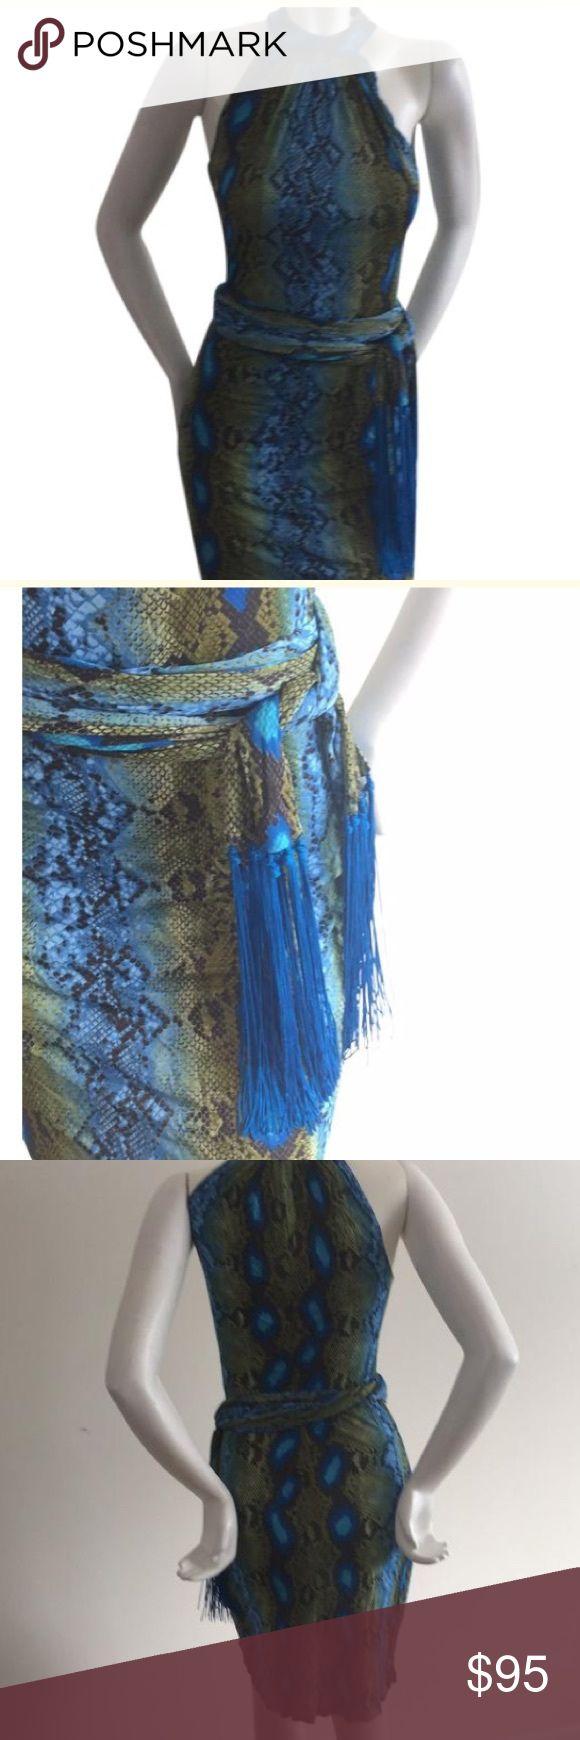 Micheal Kors python print dress Python print dress in perfect condition.  Removable belt with tassels. Michael Kors Dresses Midi